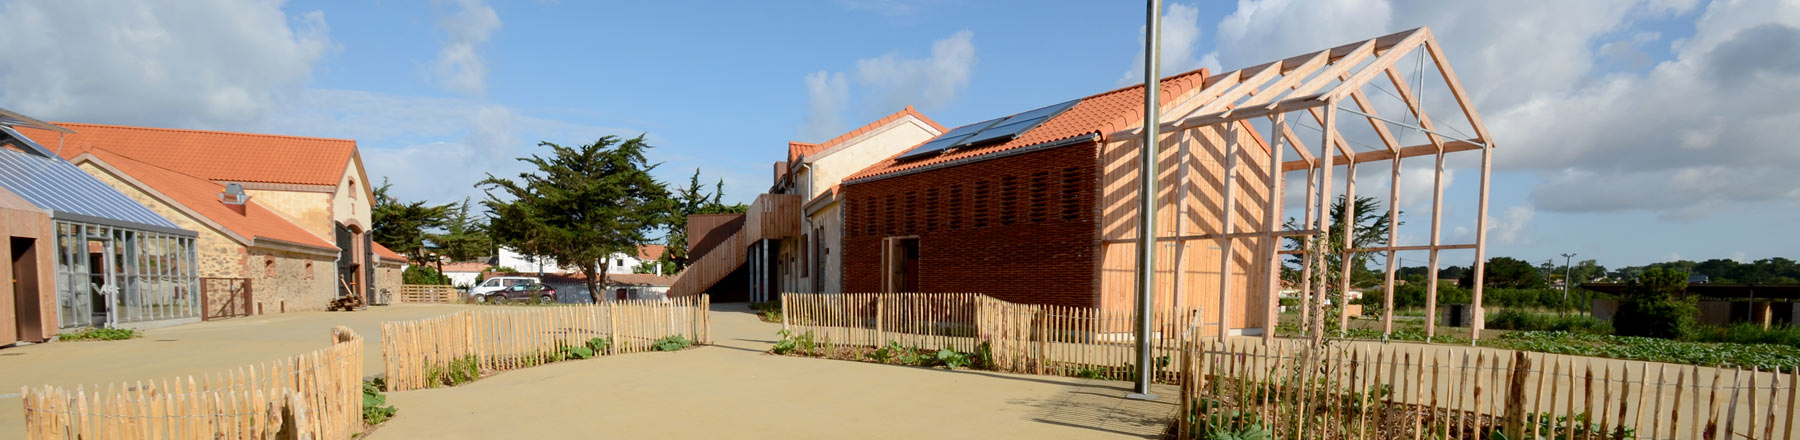 Architecture moderne et traditionnel